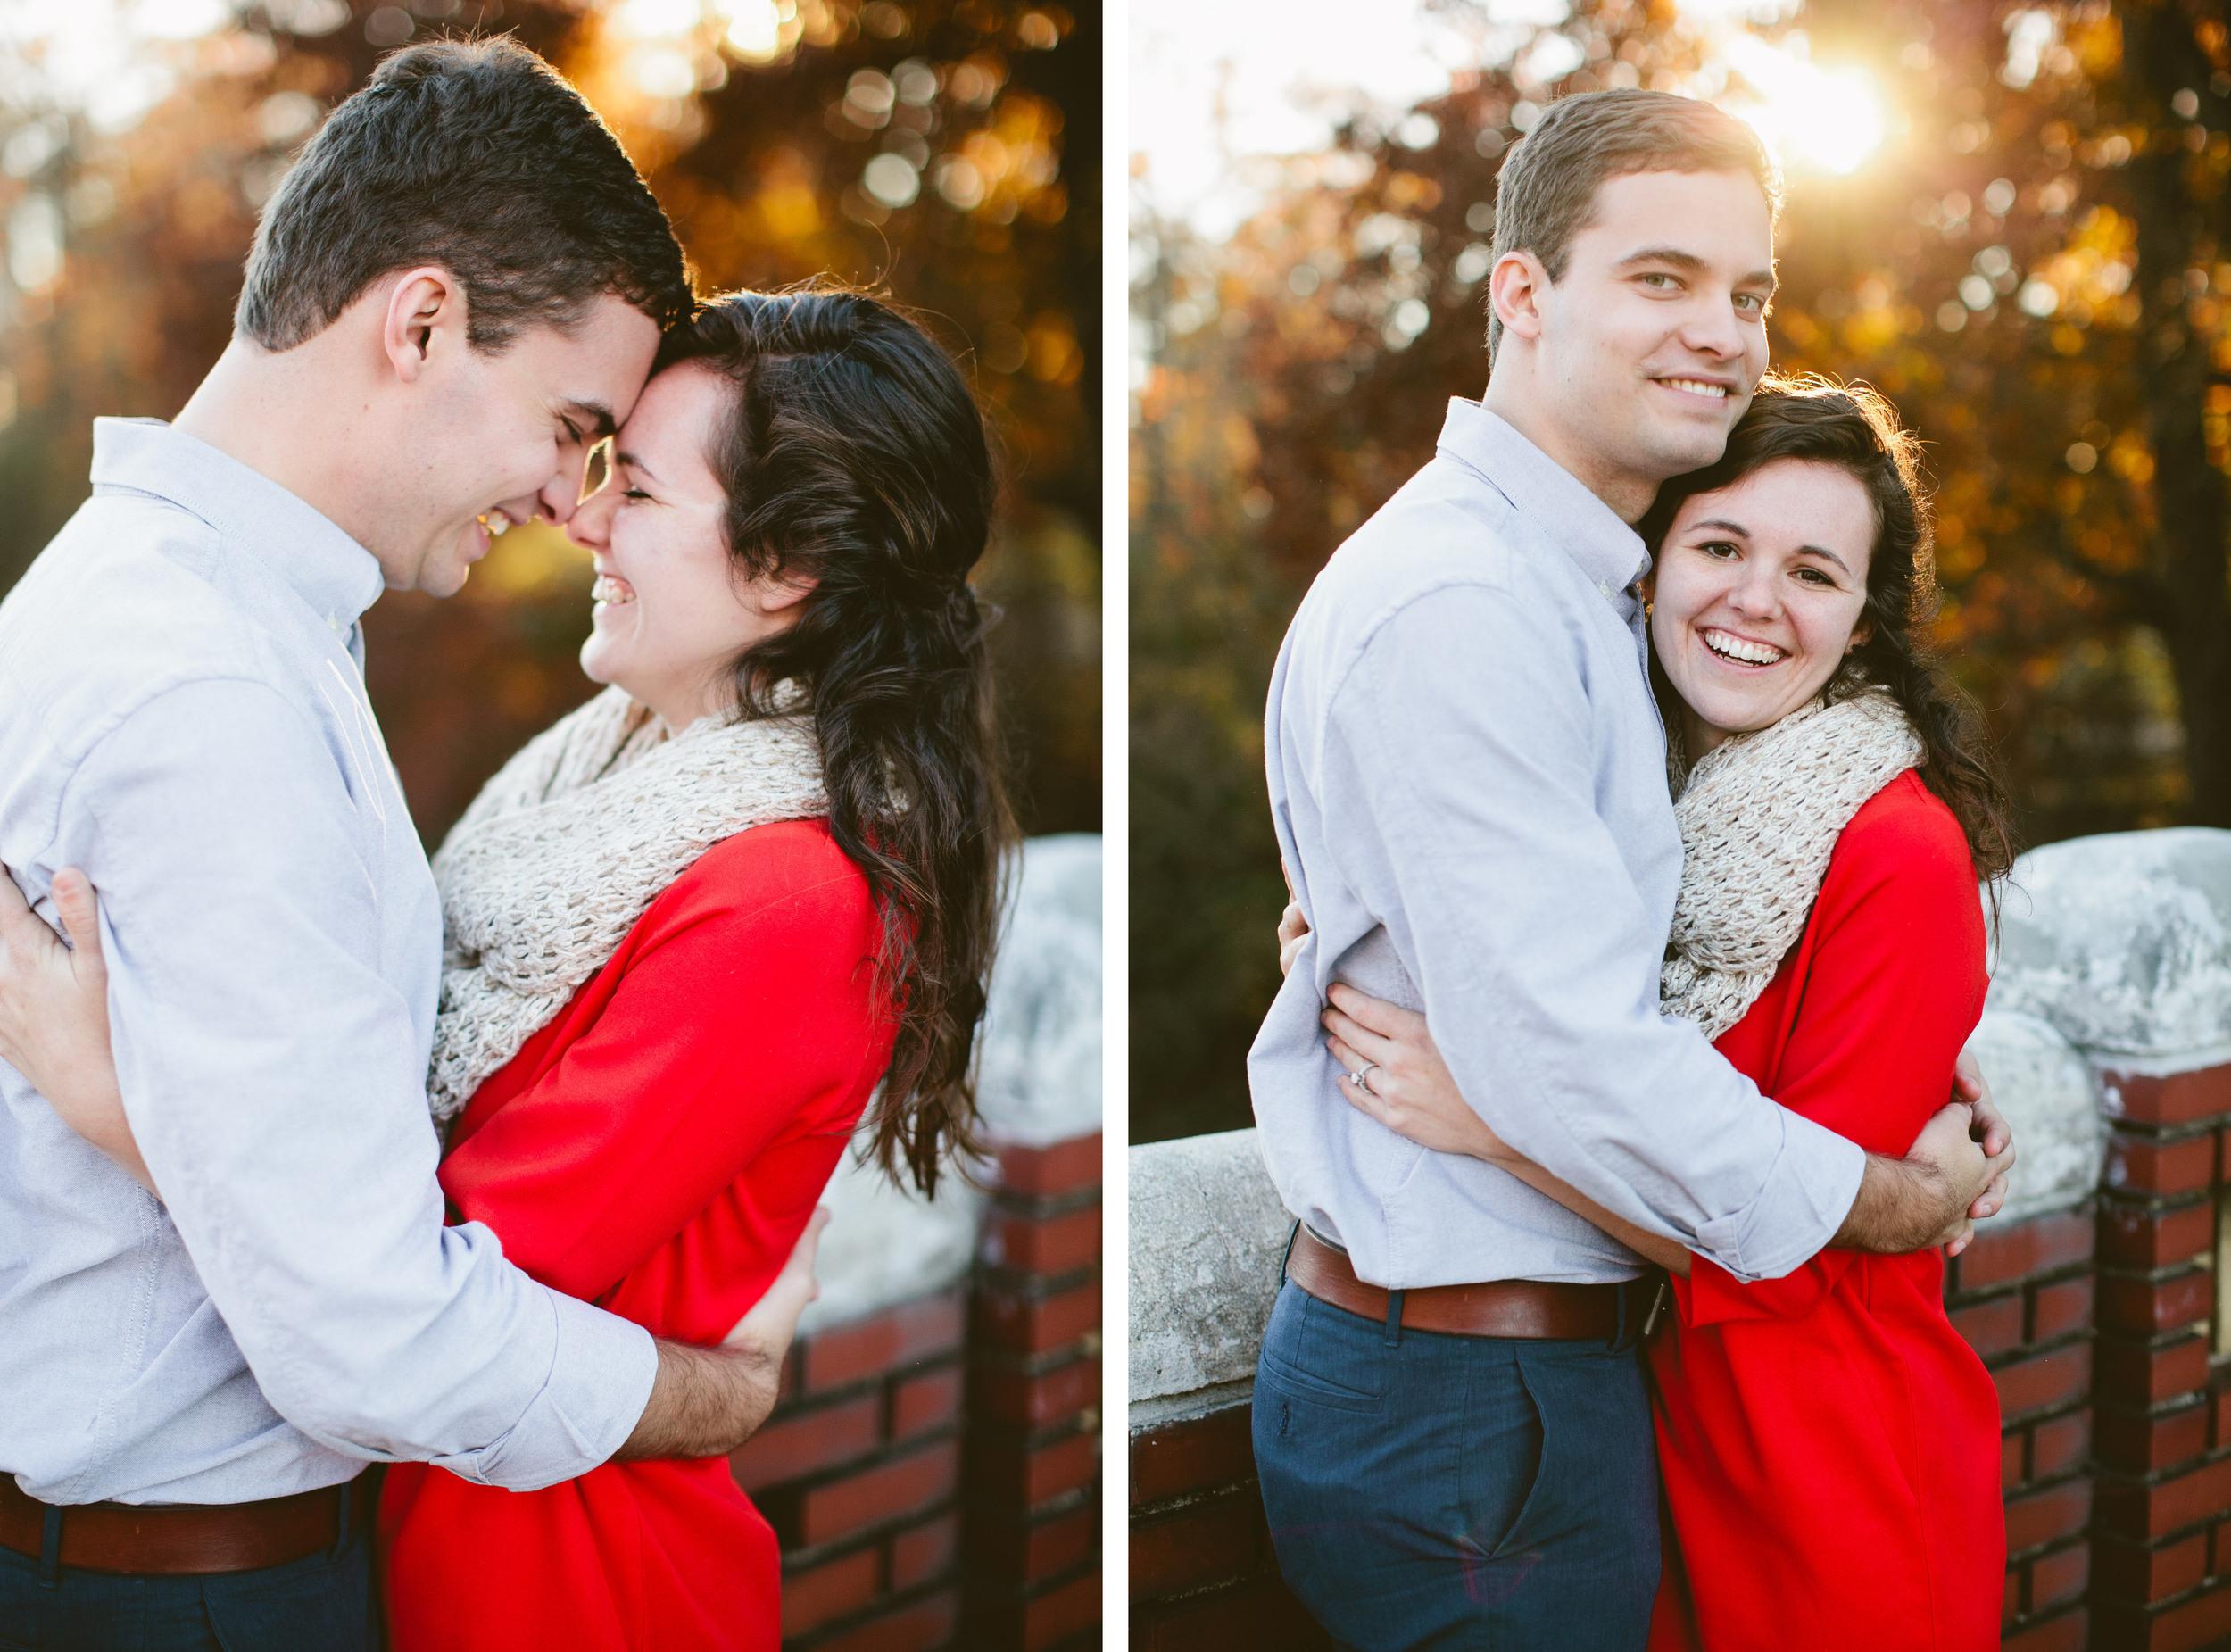 Atlanta-Engagement-Photographer-Kathryn-McCrary-Photography-Collage2.jpg